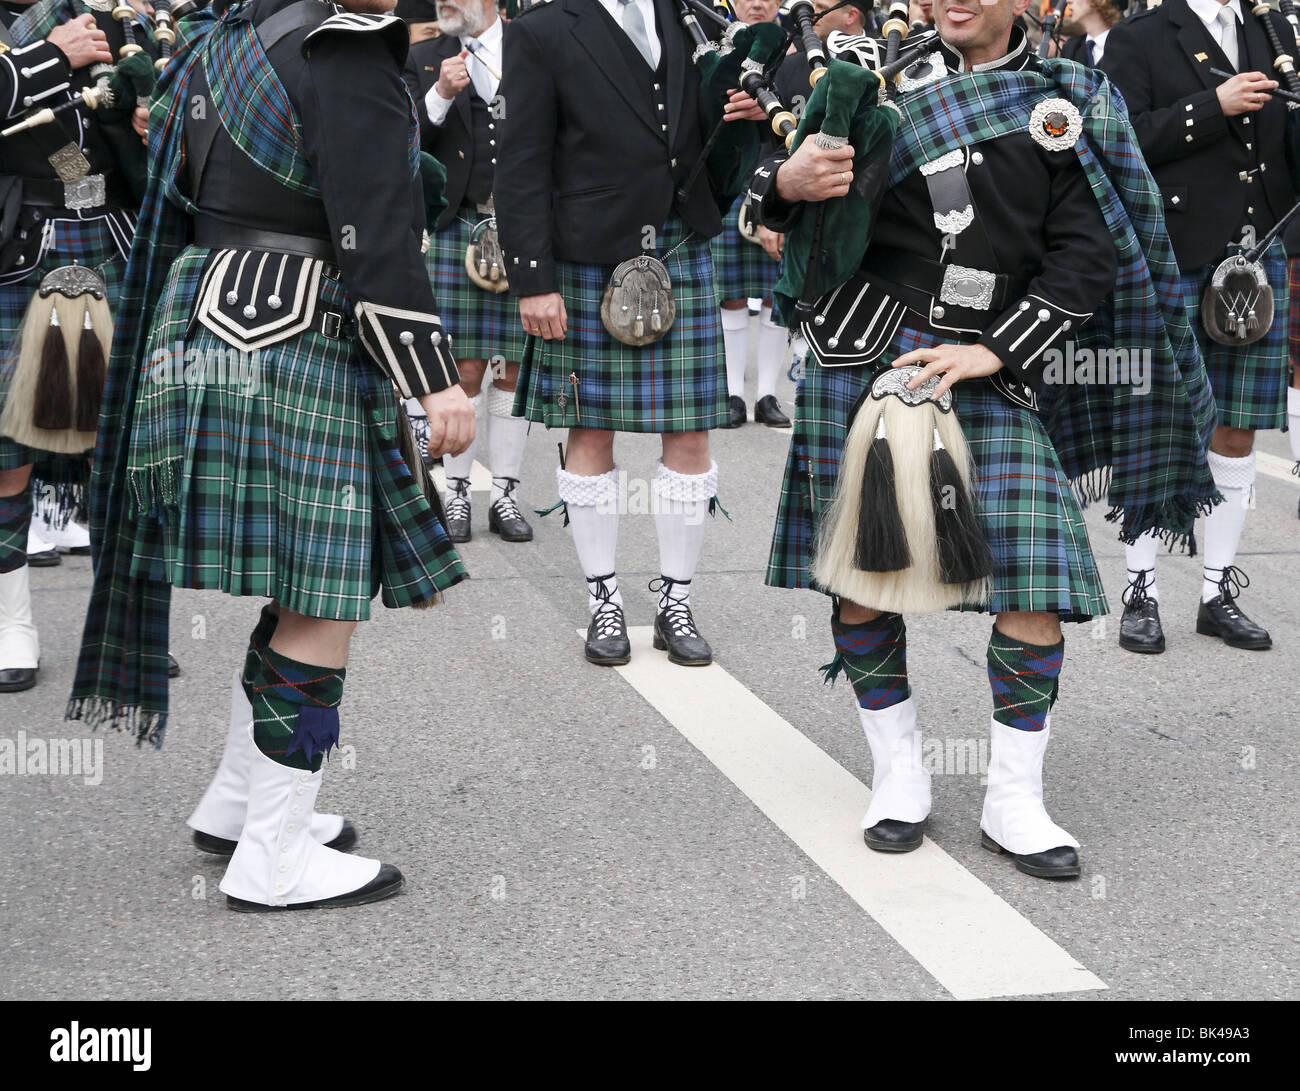 Irish musicians, celebration of St. Patricks day - Stock Image